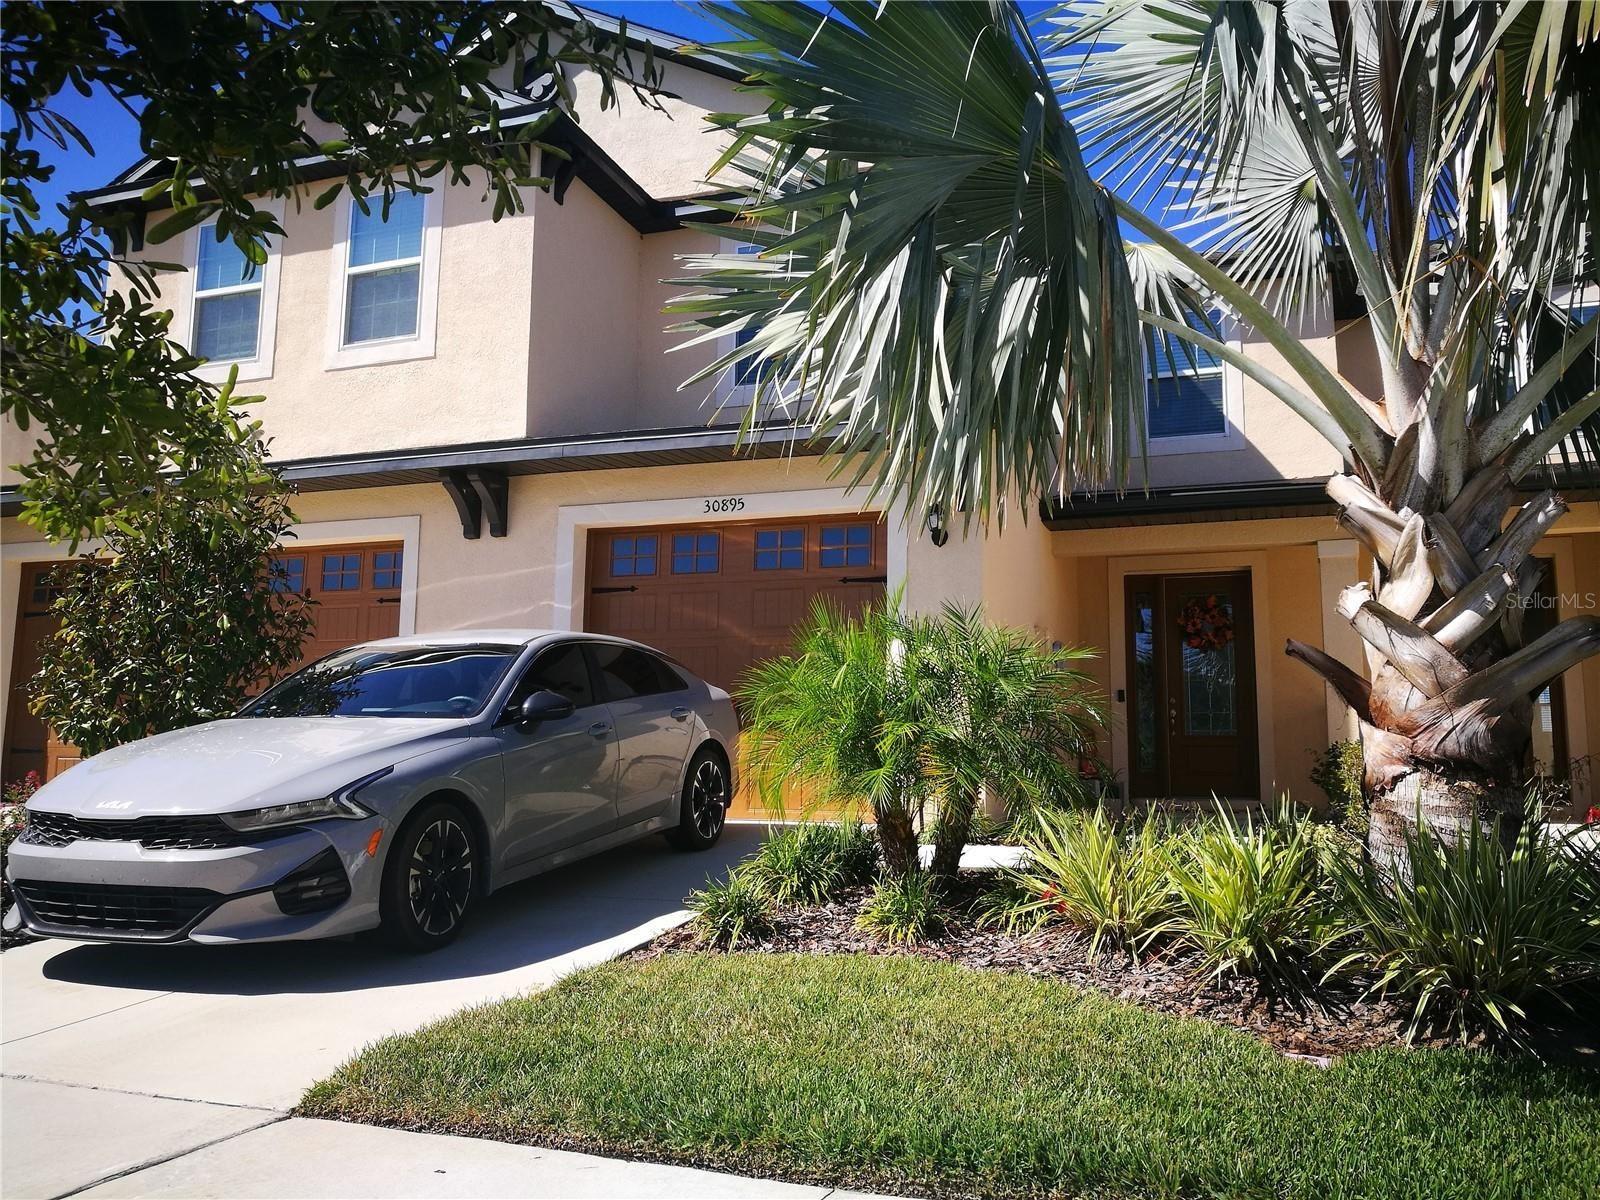 30895 QUAIL CAPER CIRCLE, San Antonio, FL 33576 - MLS#: W7839300